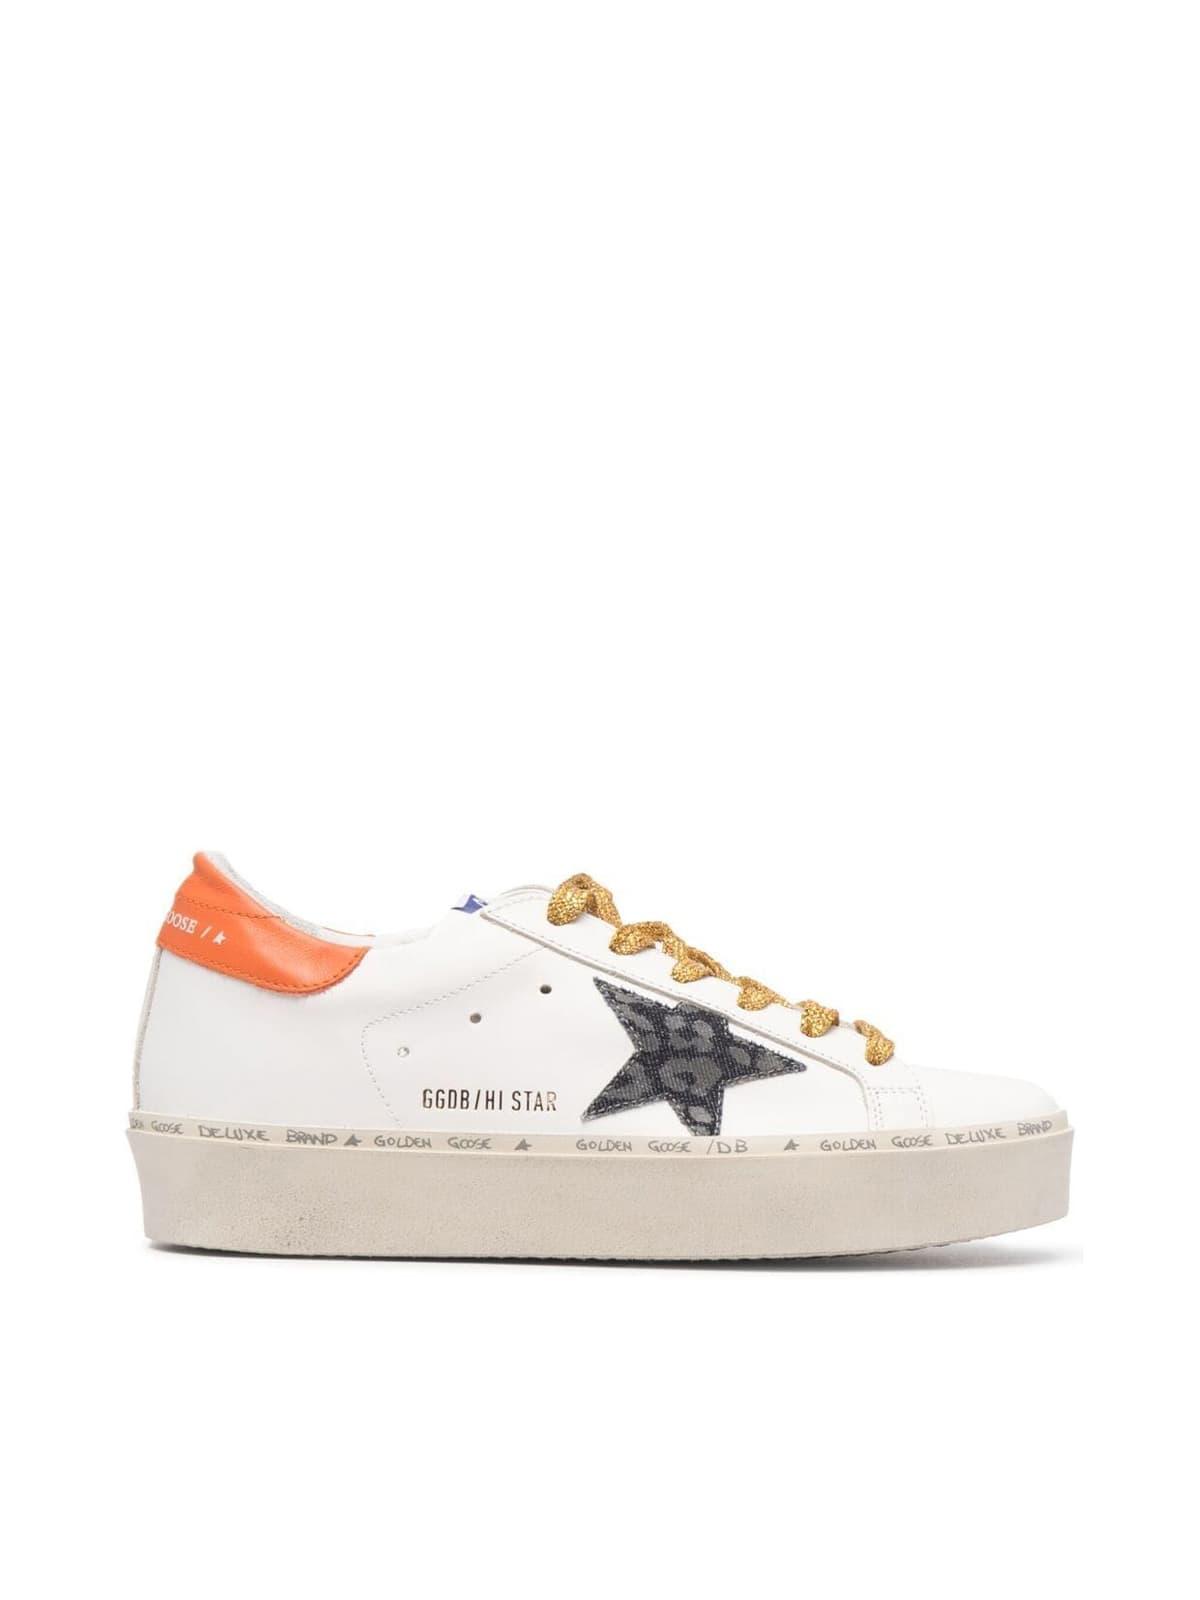 Buy Golden Goose Hi Star Leather Upper And Heel Leopard Denim Star online, shop Golden Goose shoes with free shipping